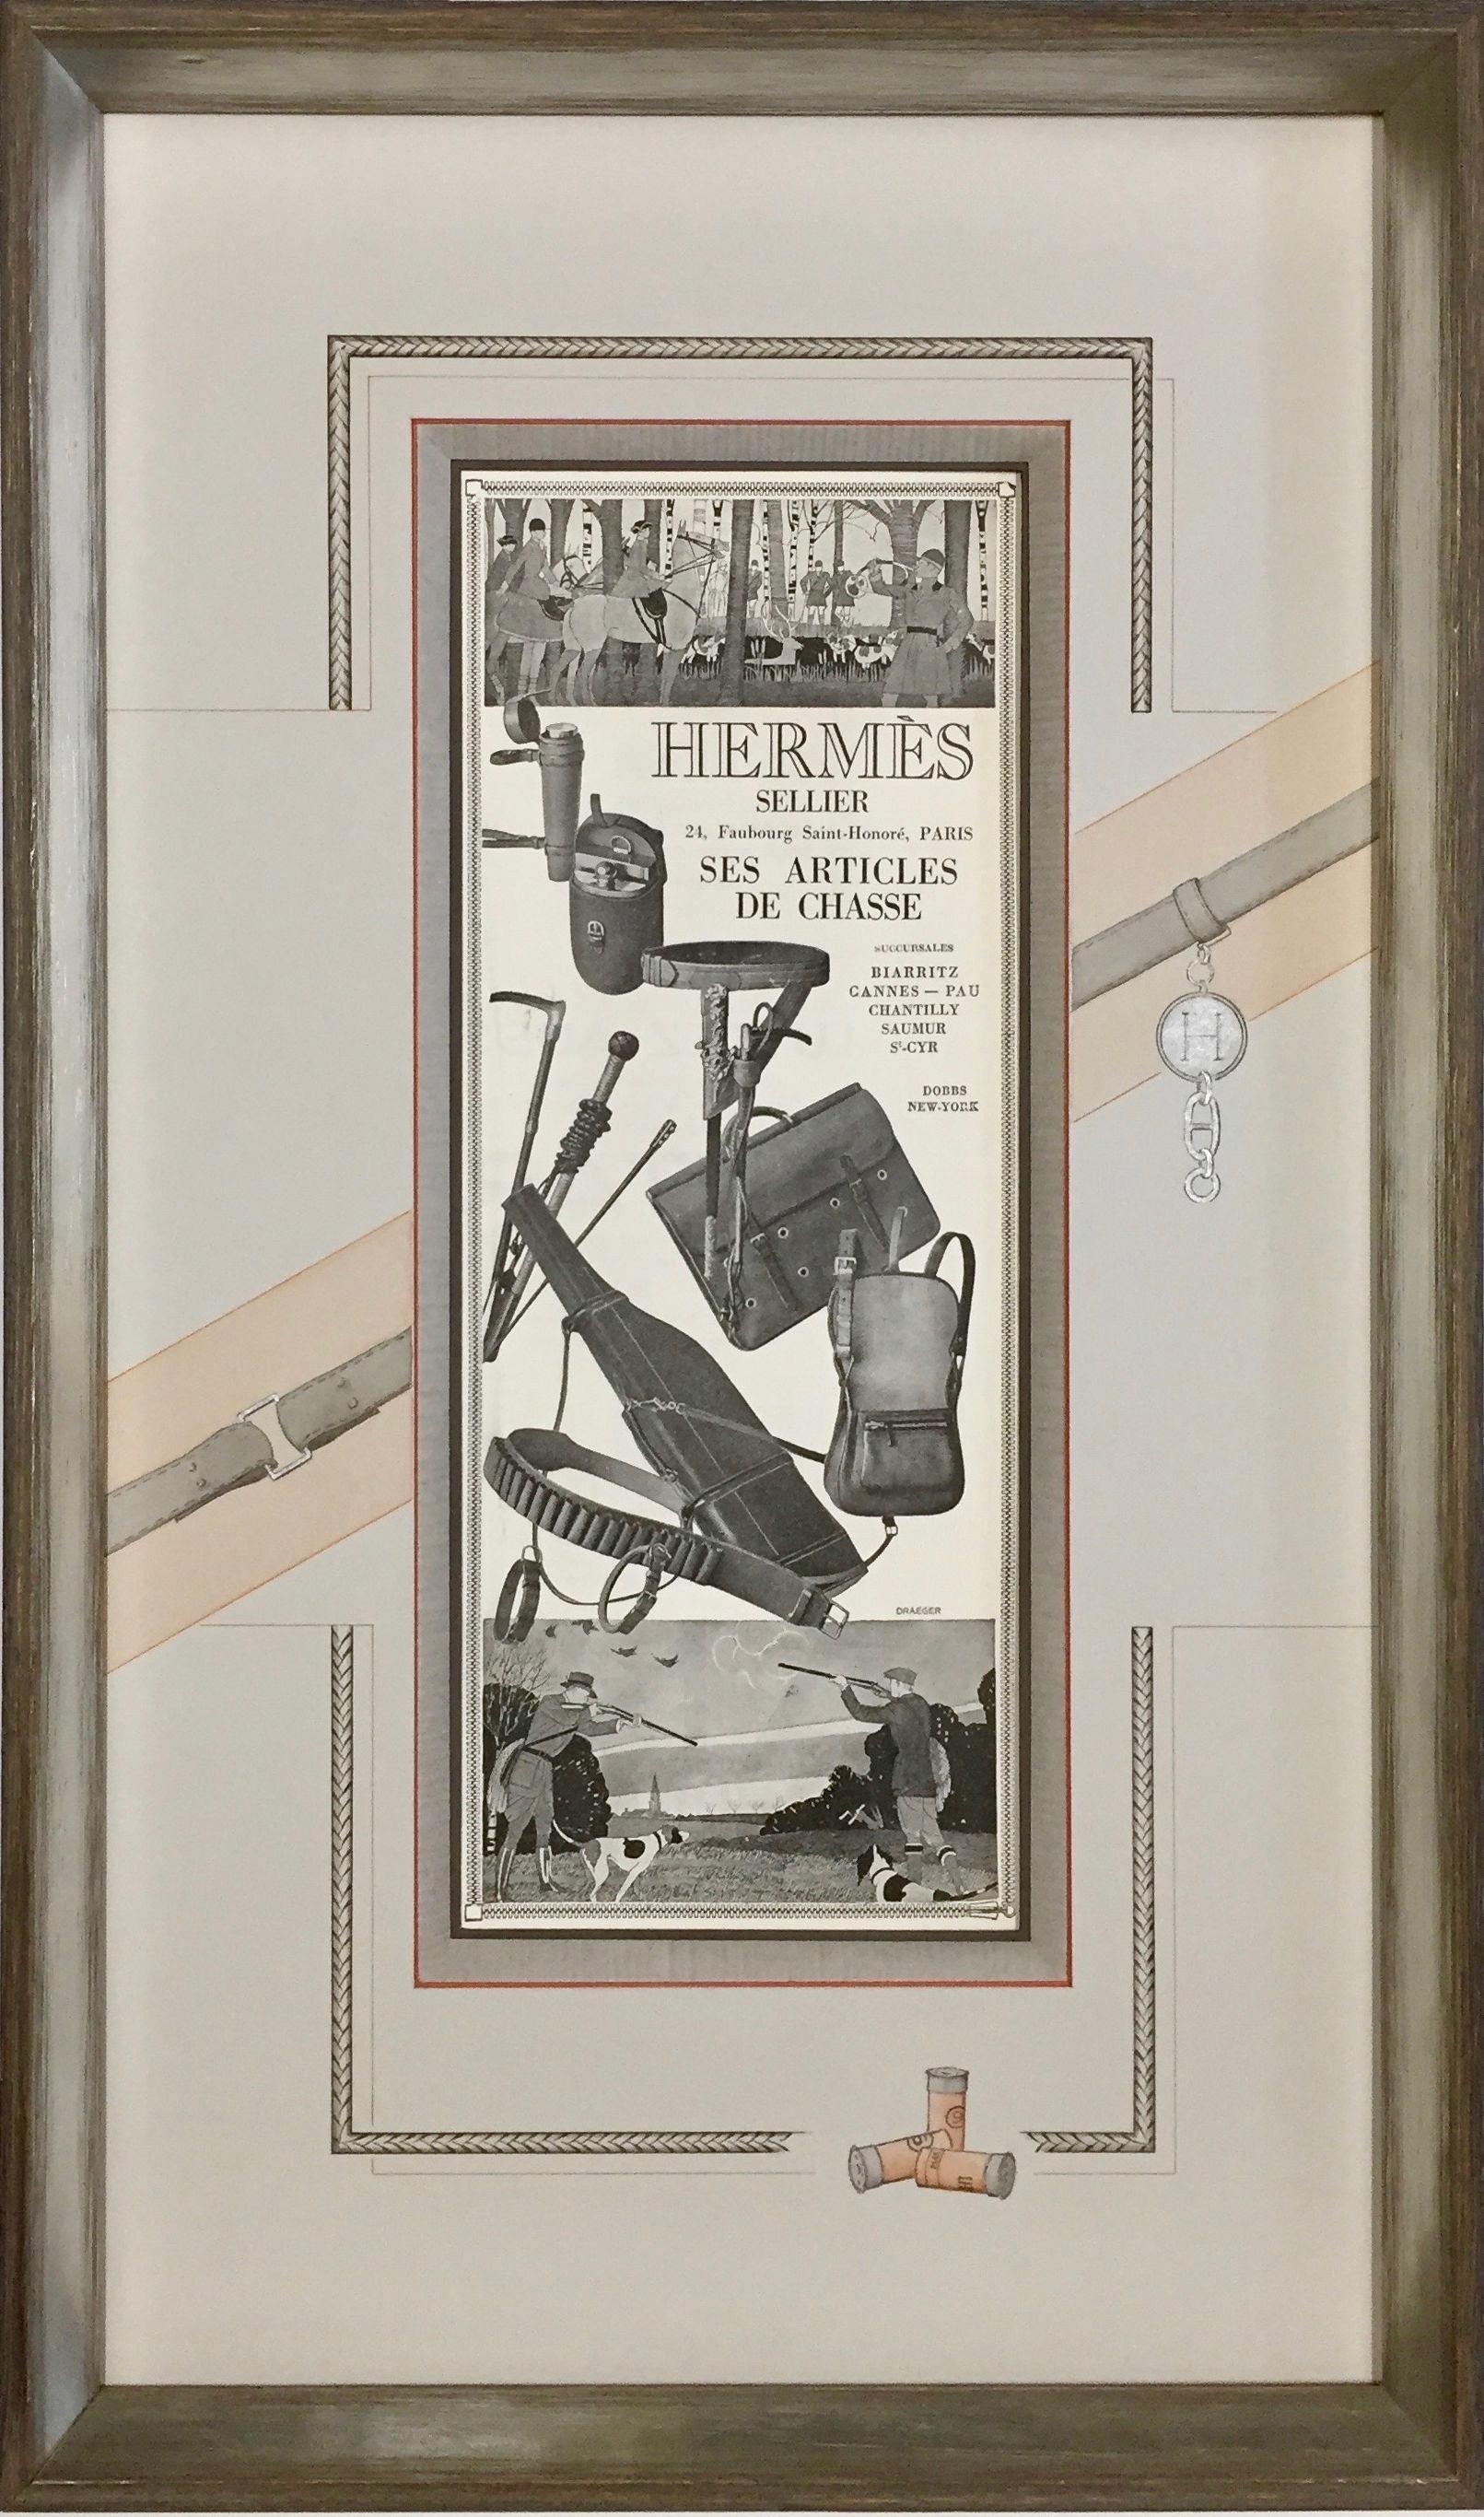 Chasse et sellerie Hermès